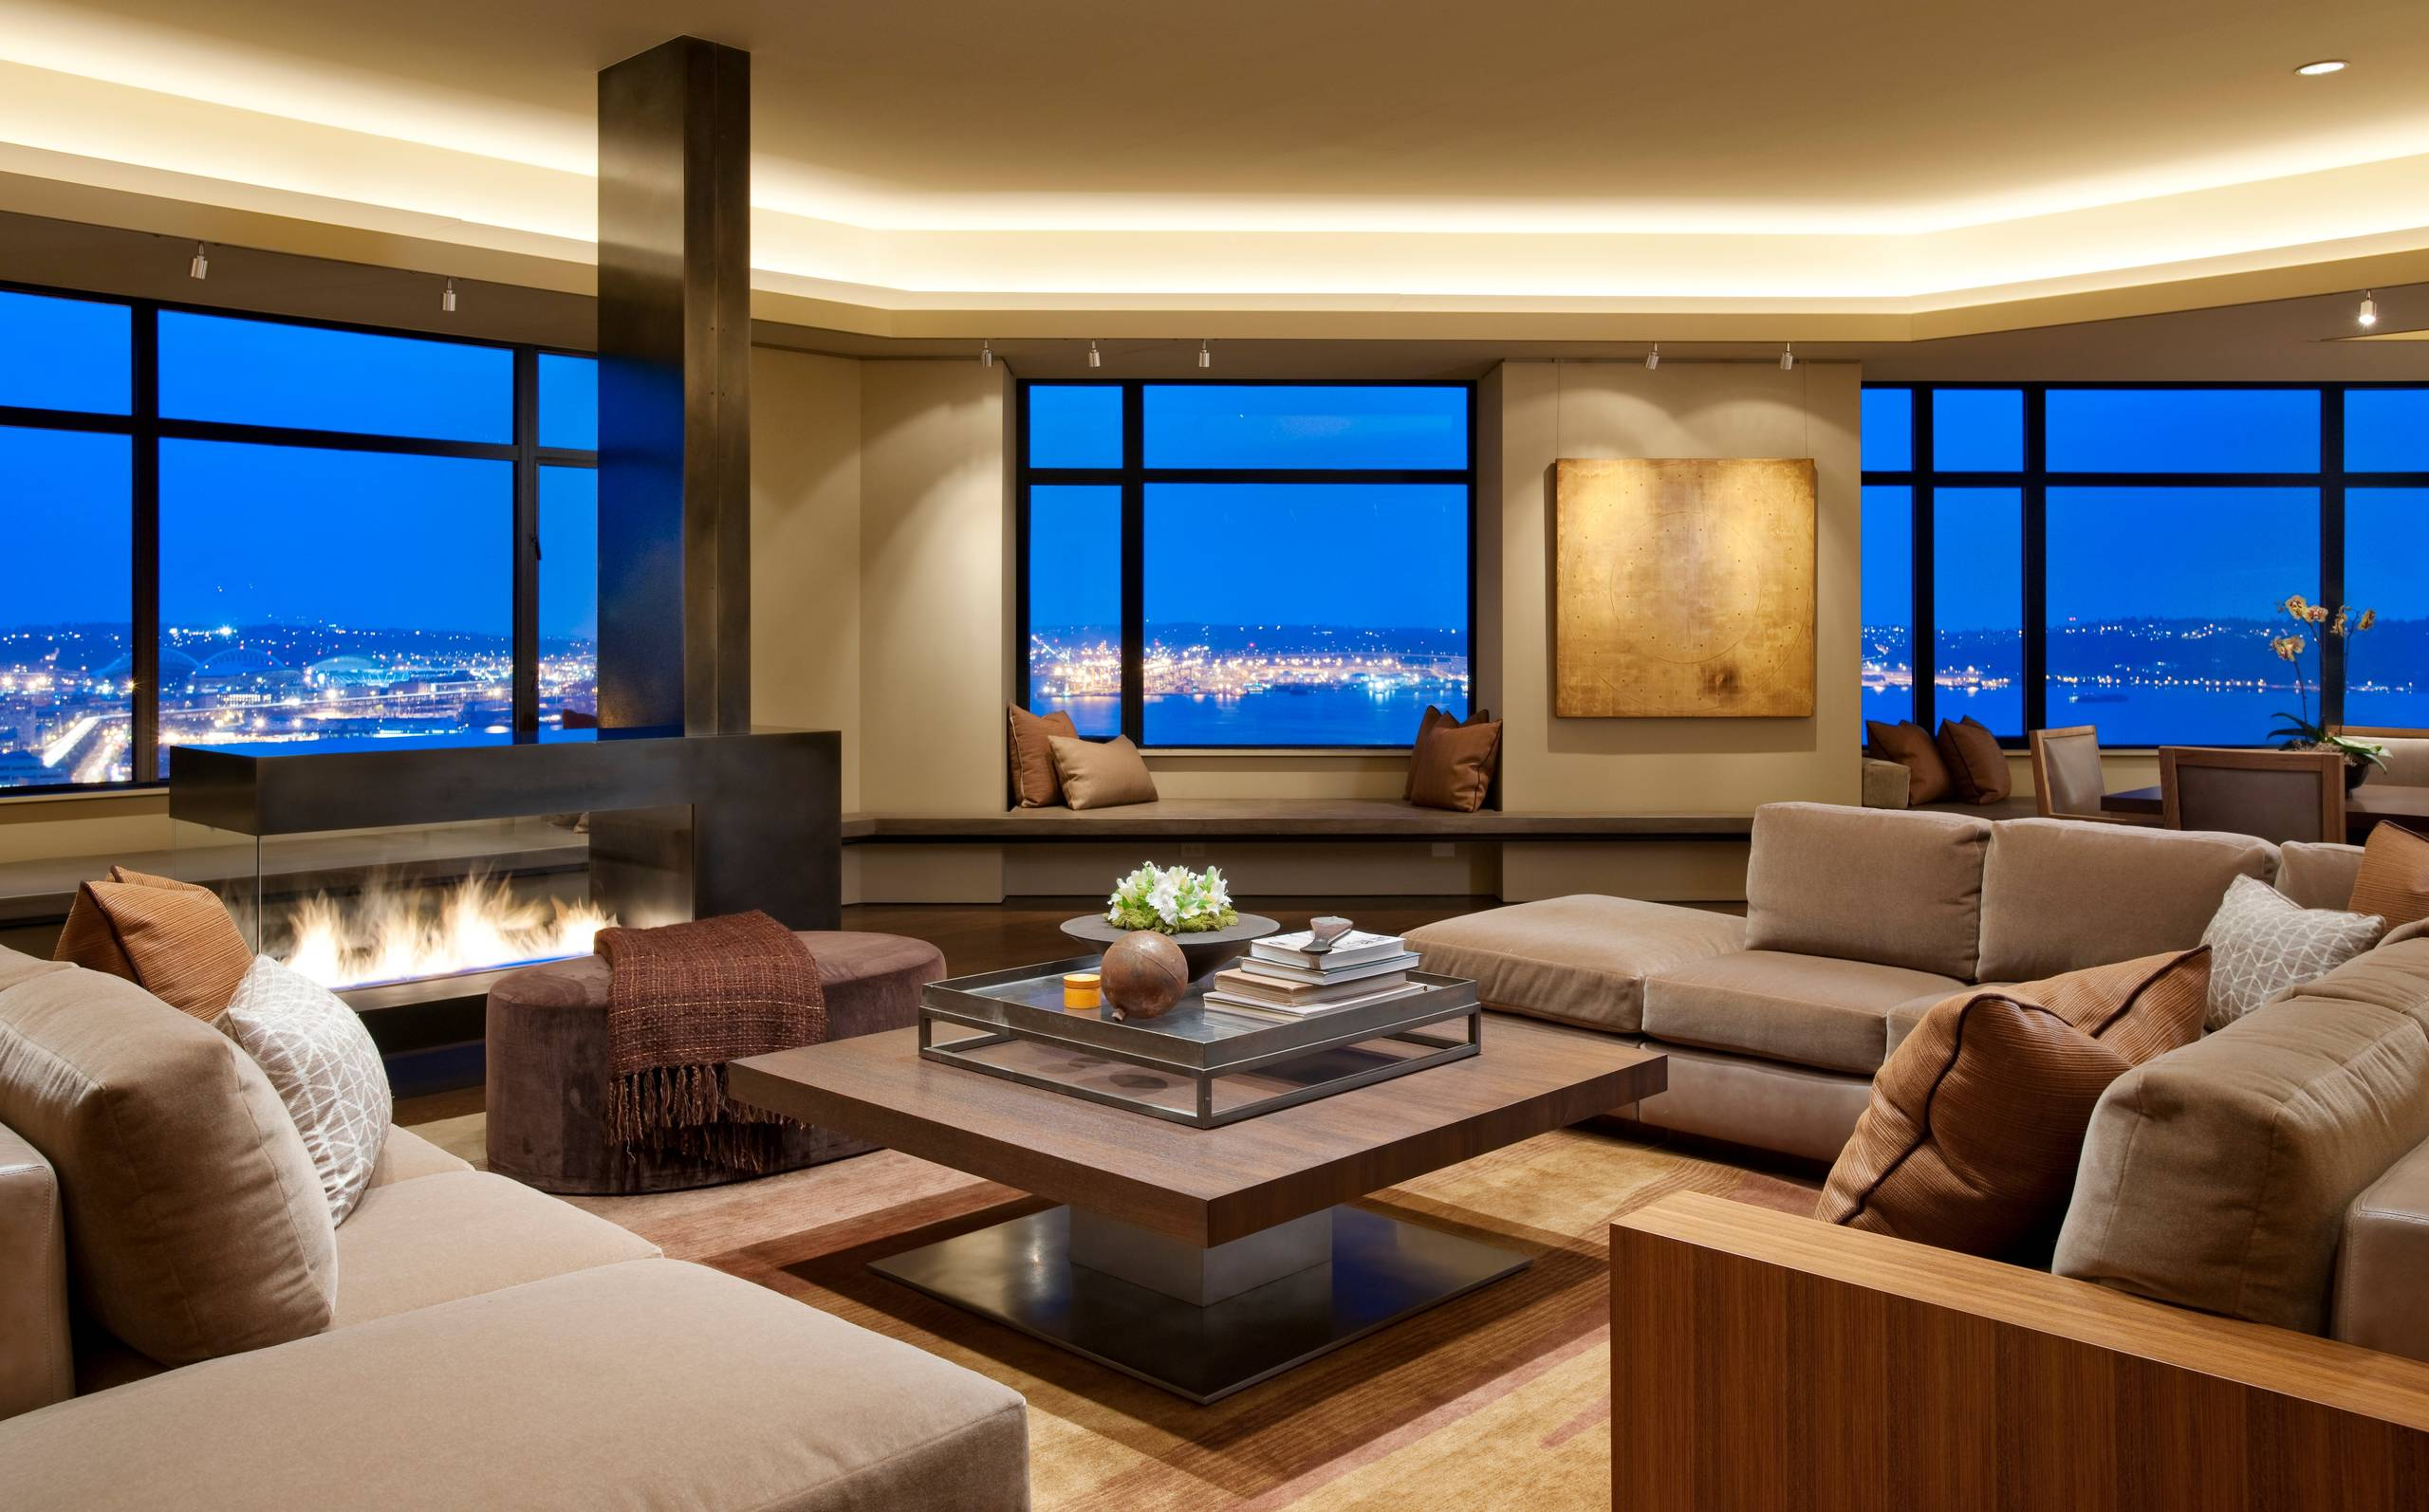 15 Beautiful Modern Living Room Designs Your Home ... on Beautiful Room Pics  id=28651